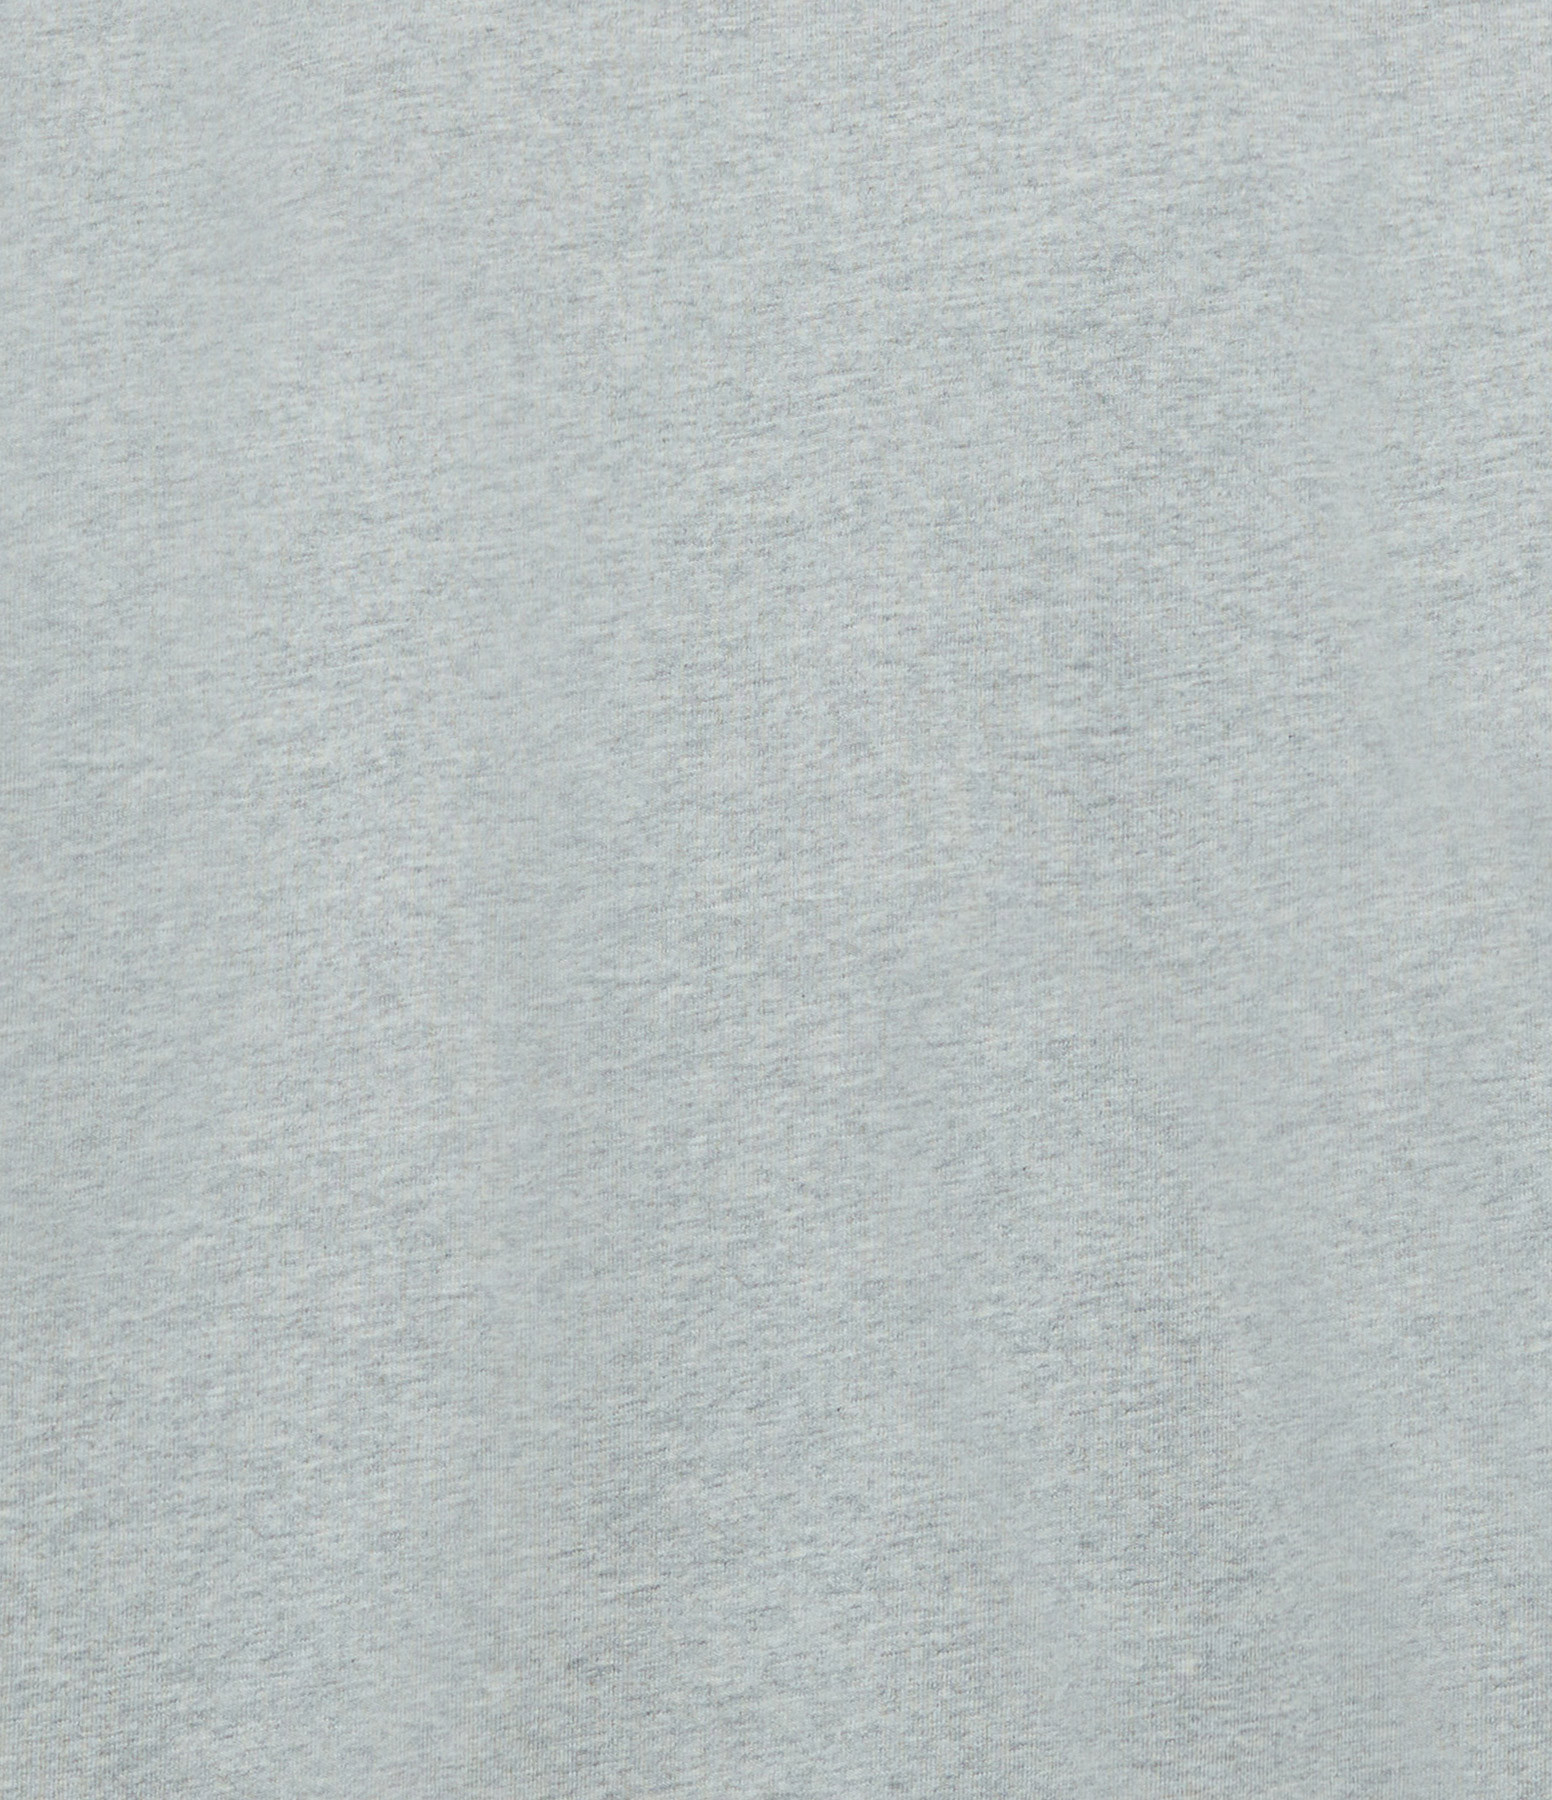 VICTORIA VICTORIA BECKHAM - Tee-shirt Logo Gris